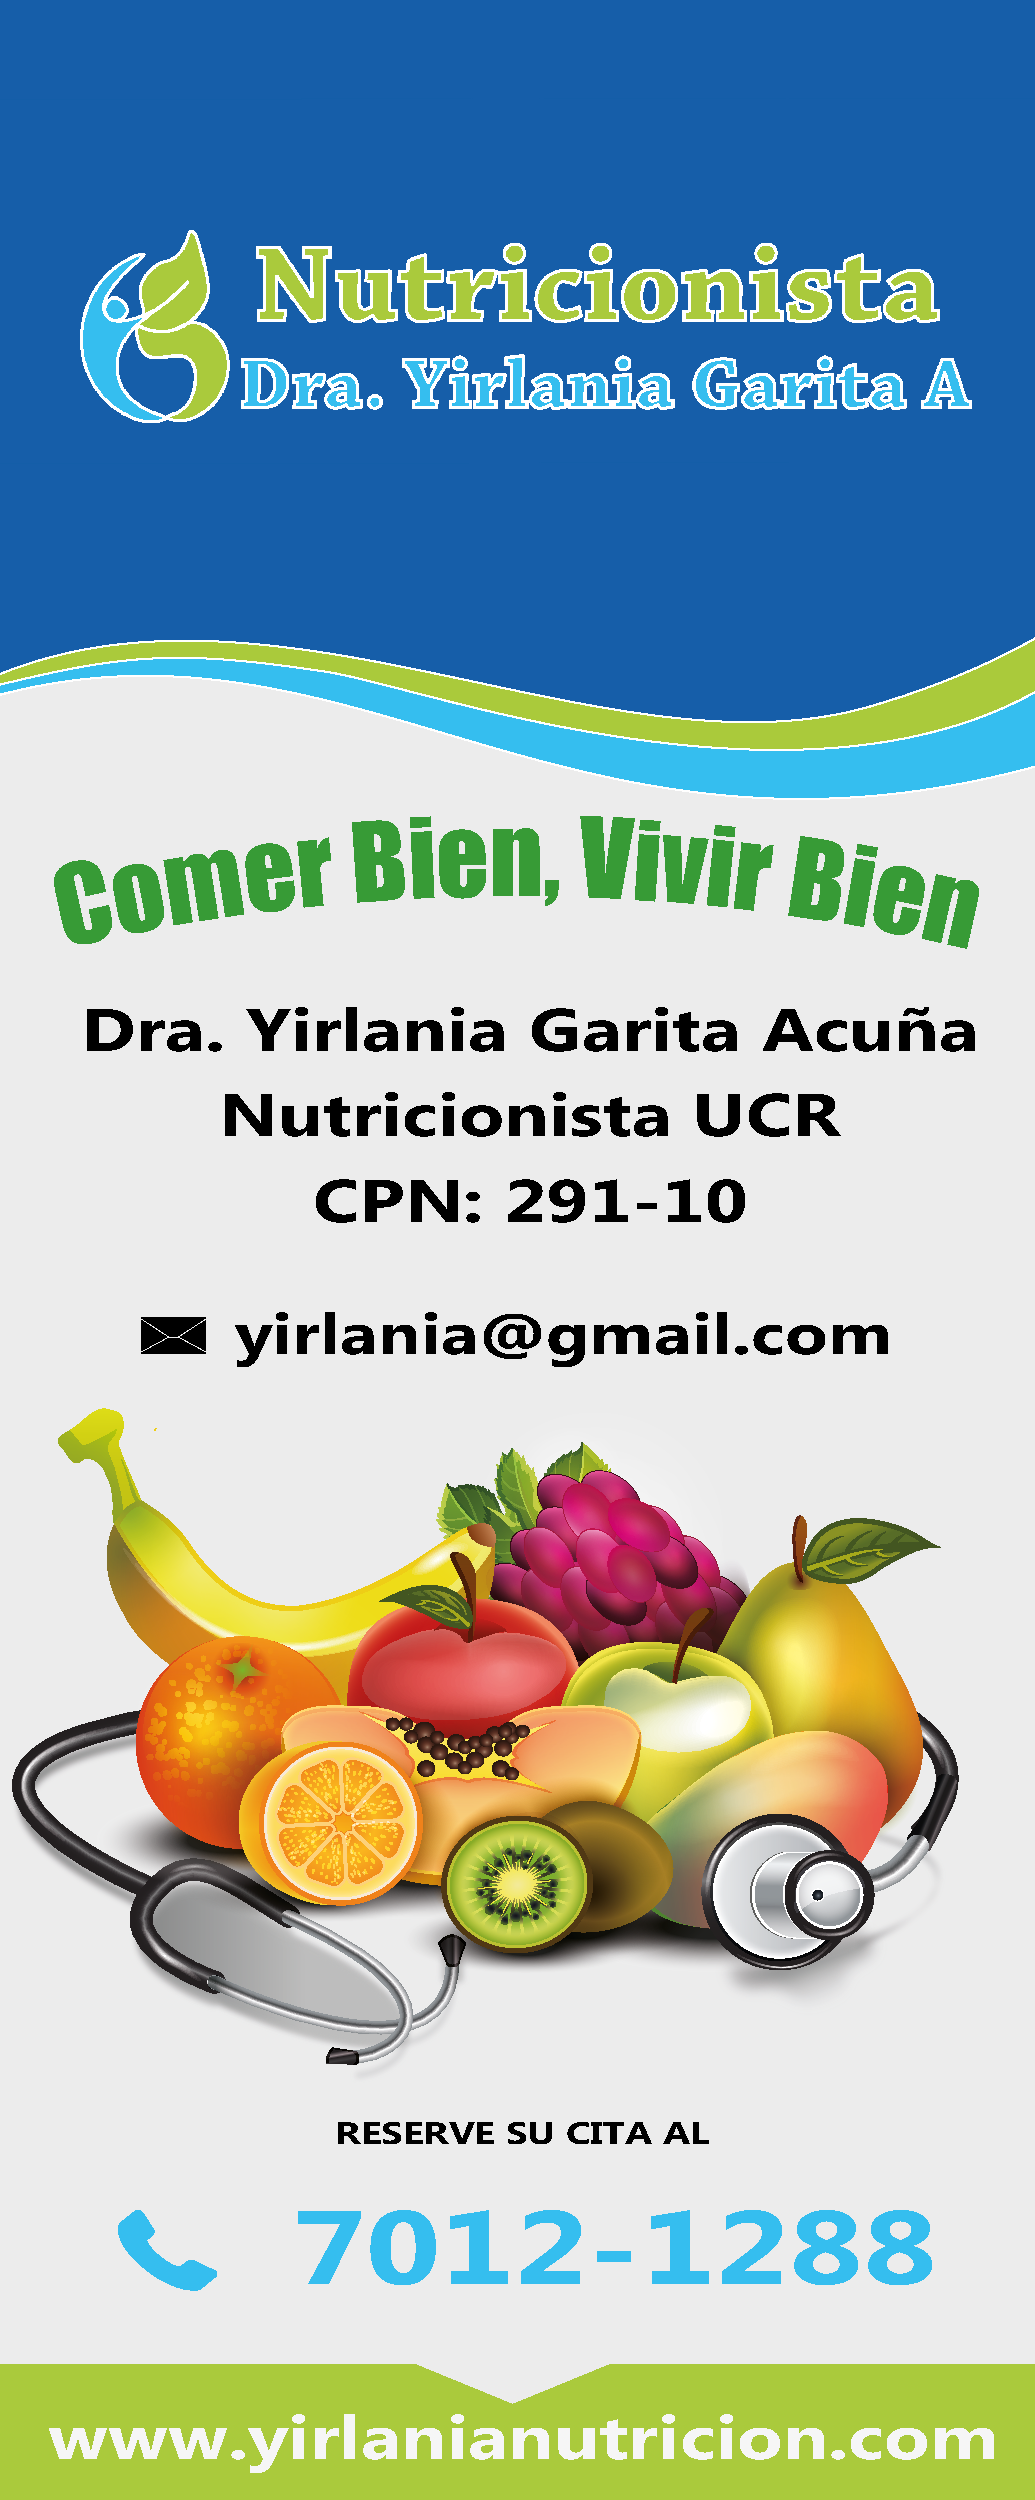 Dra Yirlania Garita A - Nutricionista